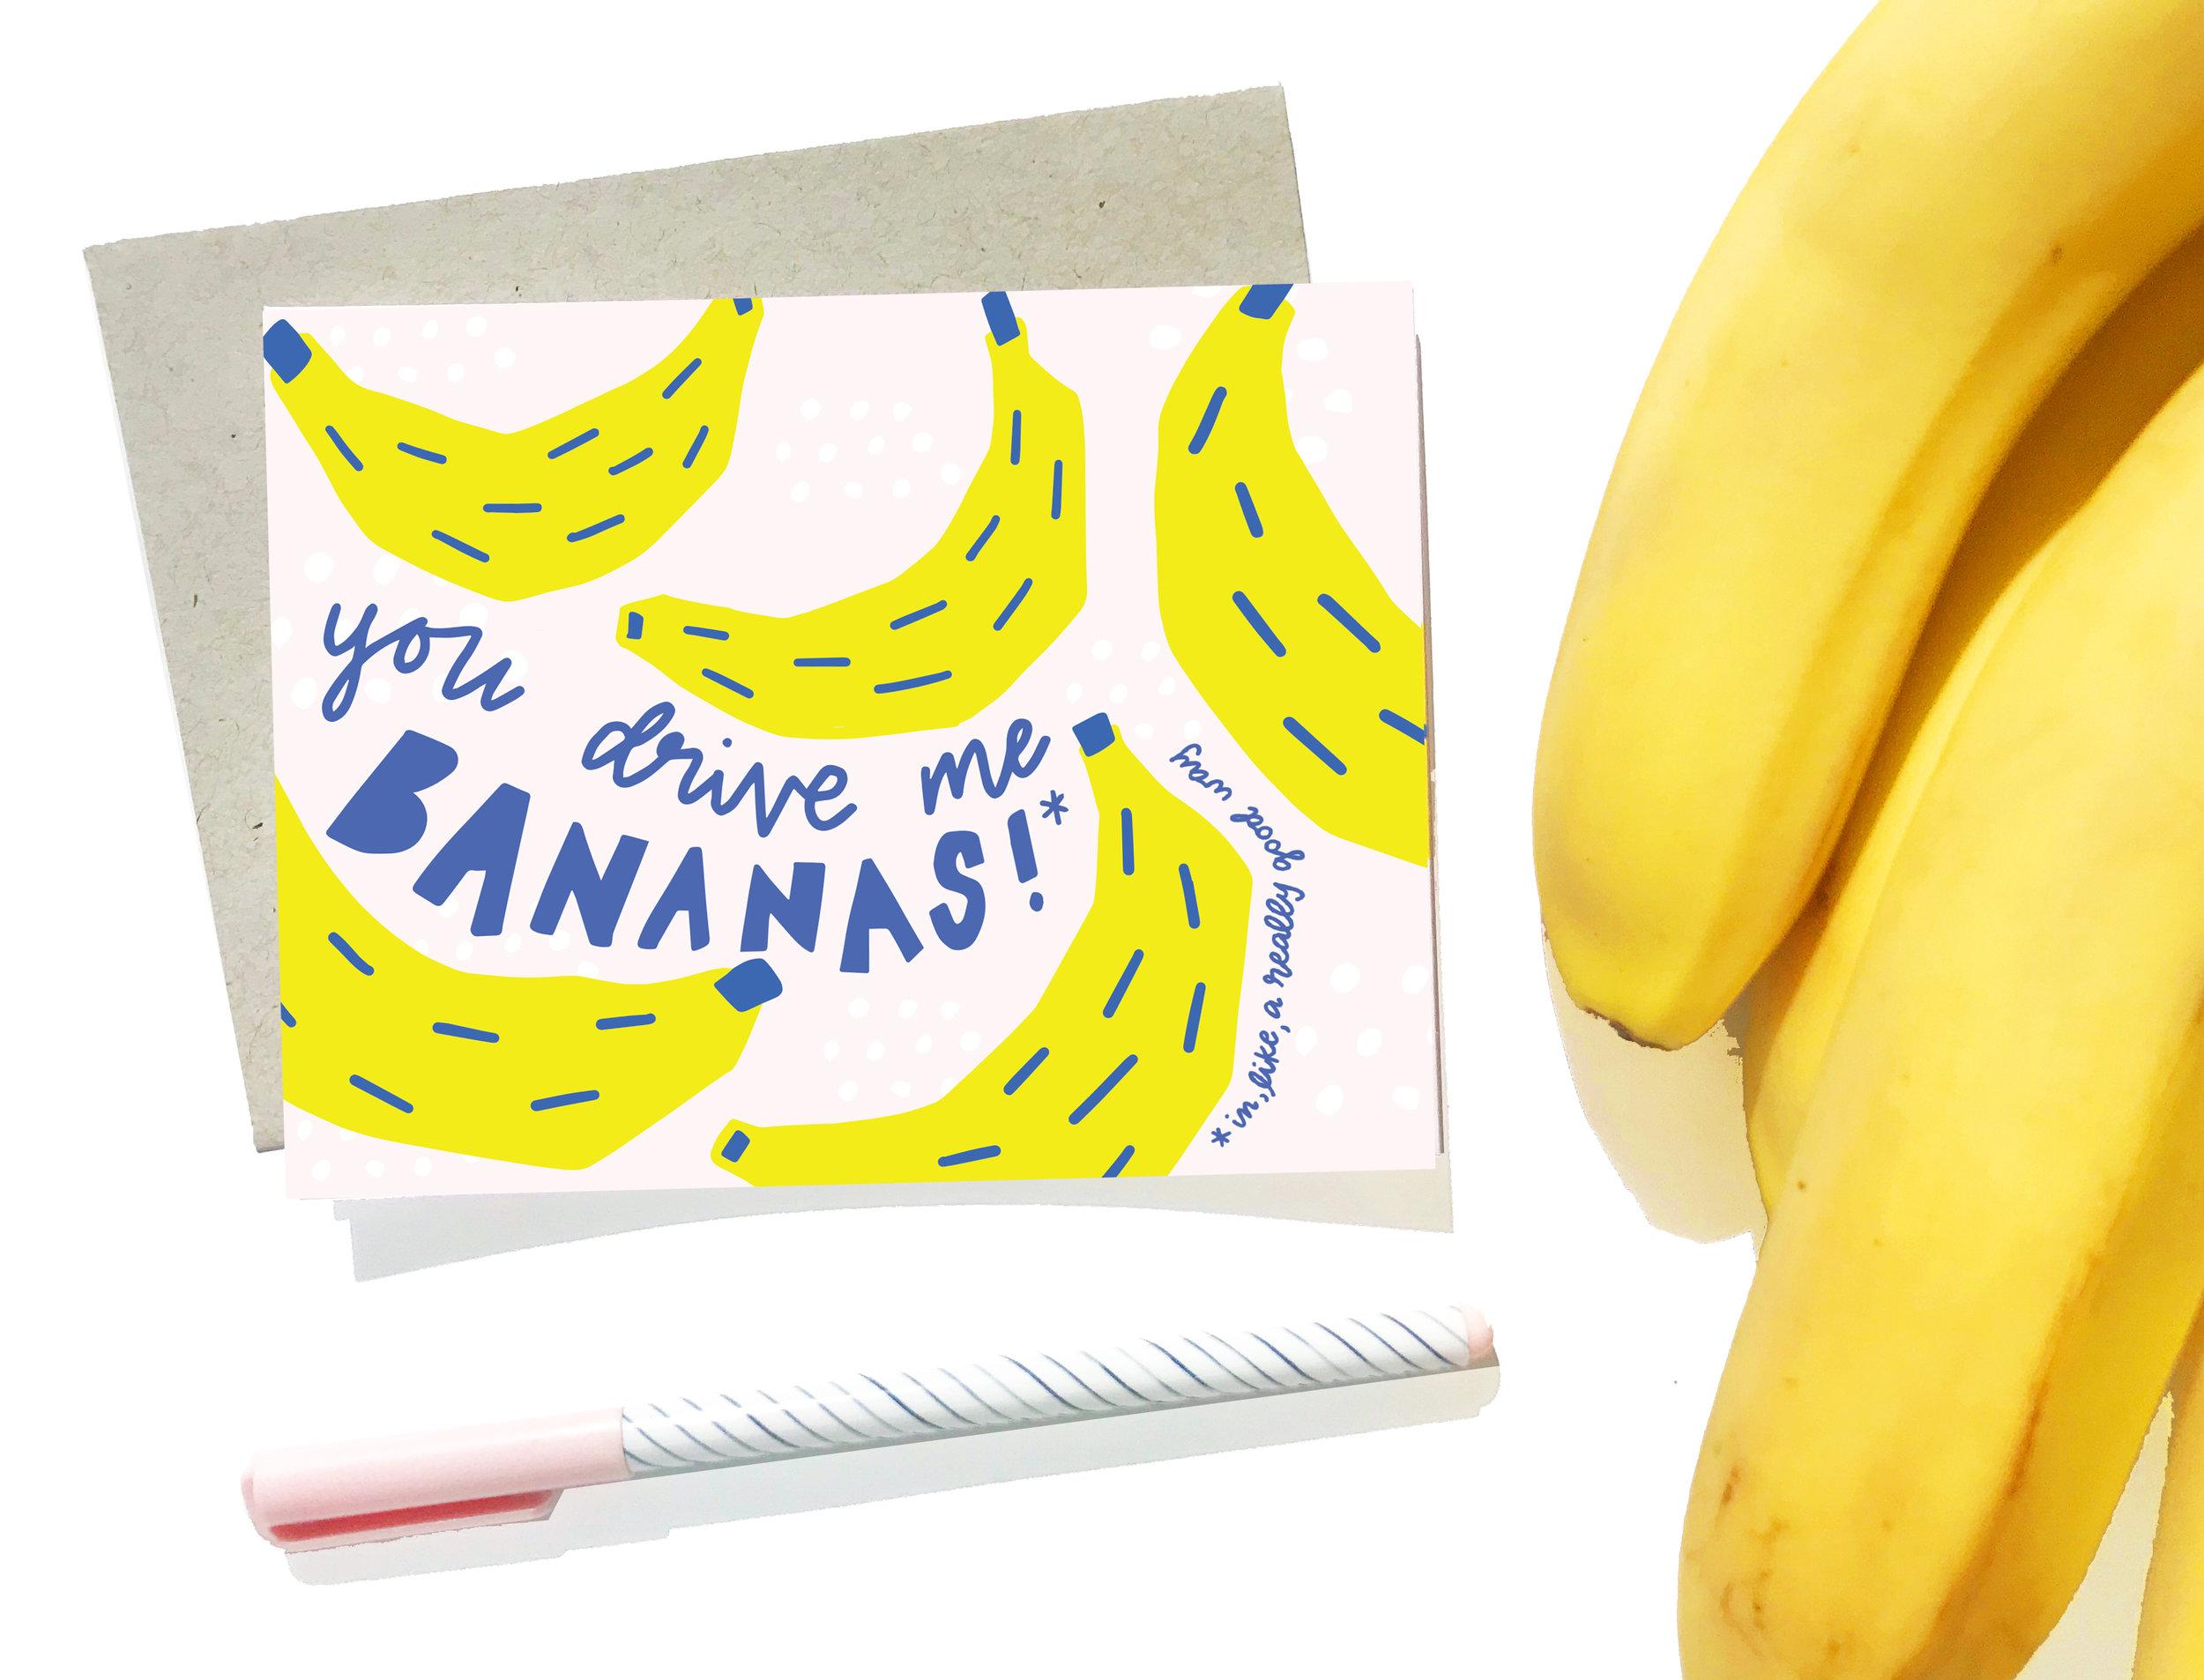 Drive Me Bananas With Bananas Product Shot.jpg